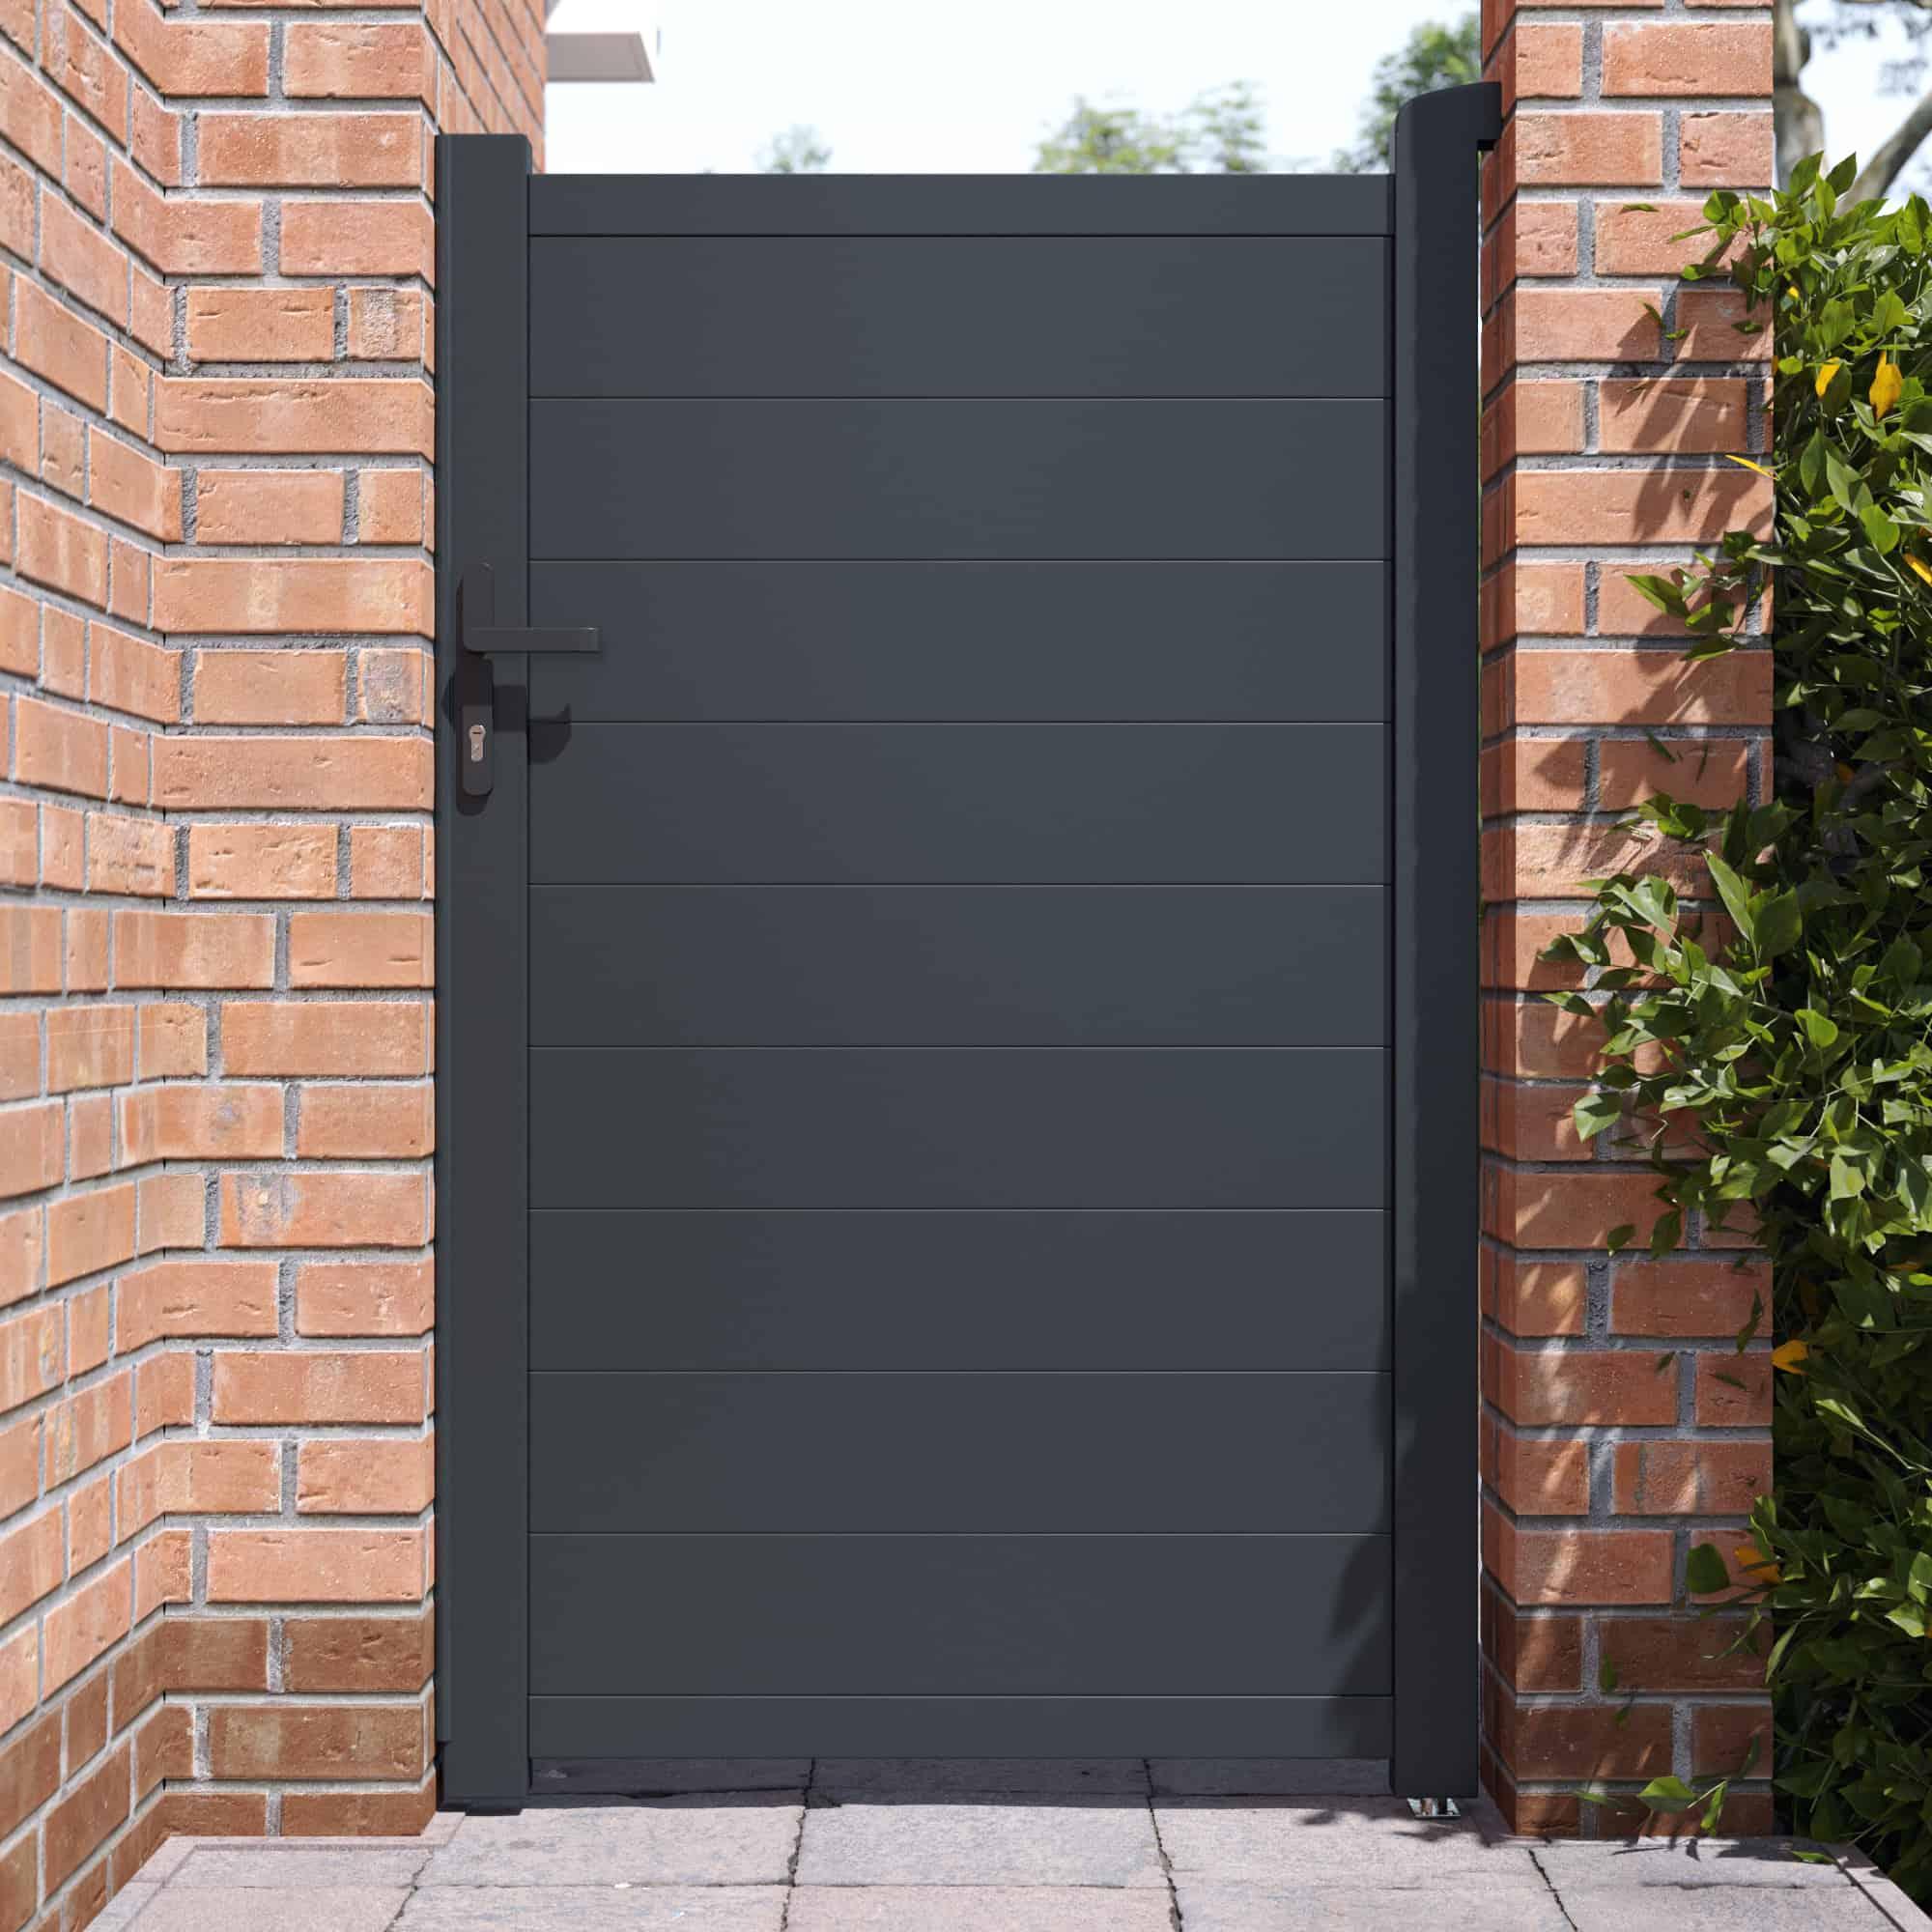 BillyOh Nova full privacy side gate